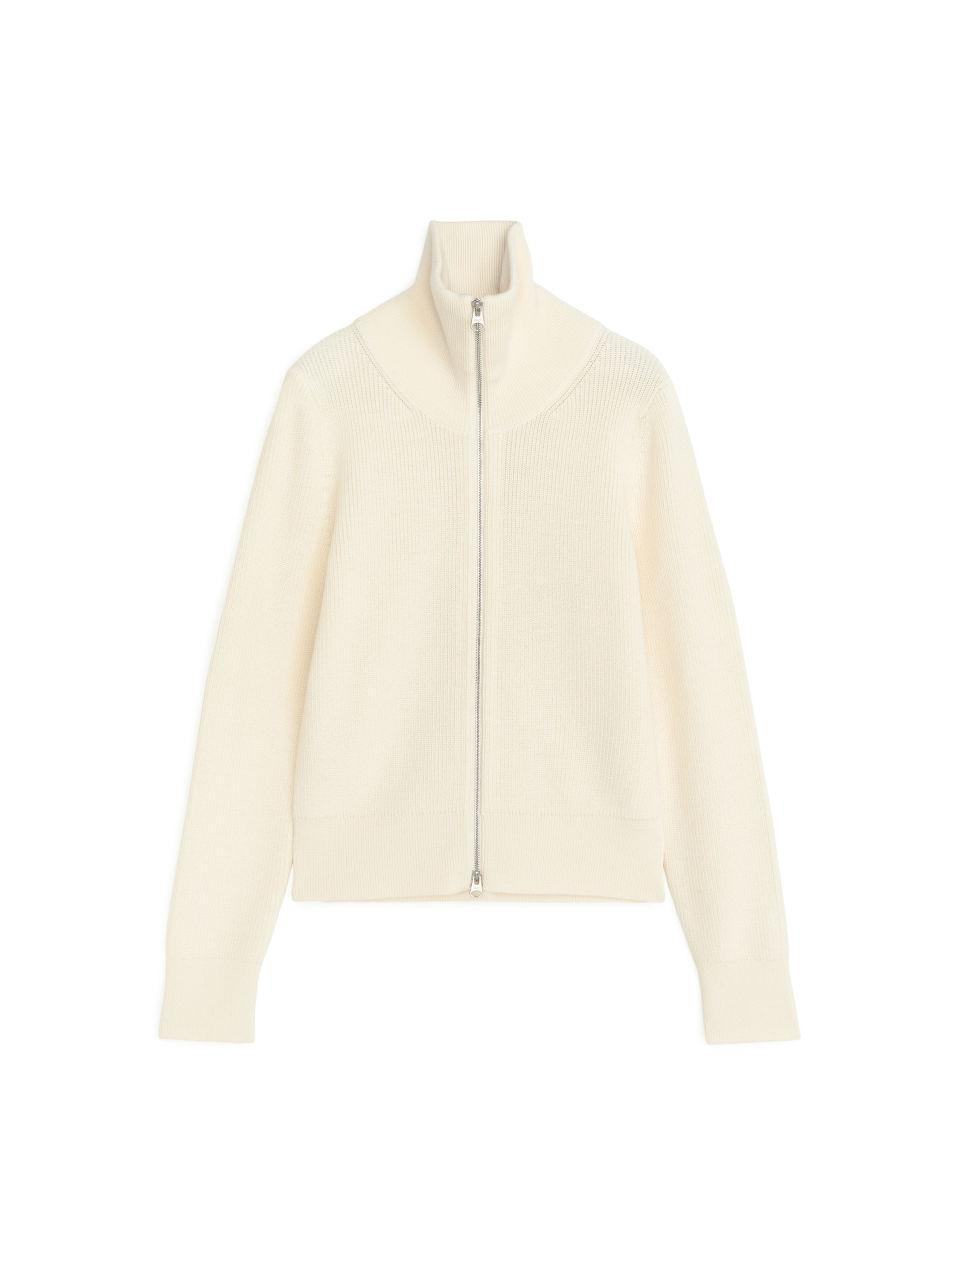 Wool Cotton Zipped Cardigan - White